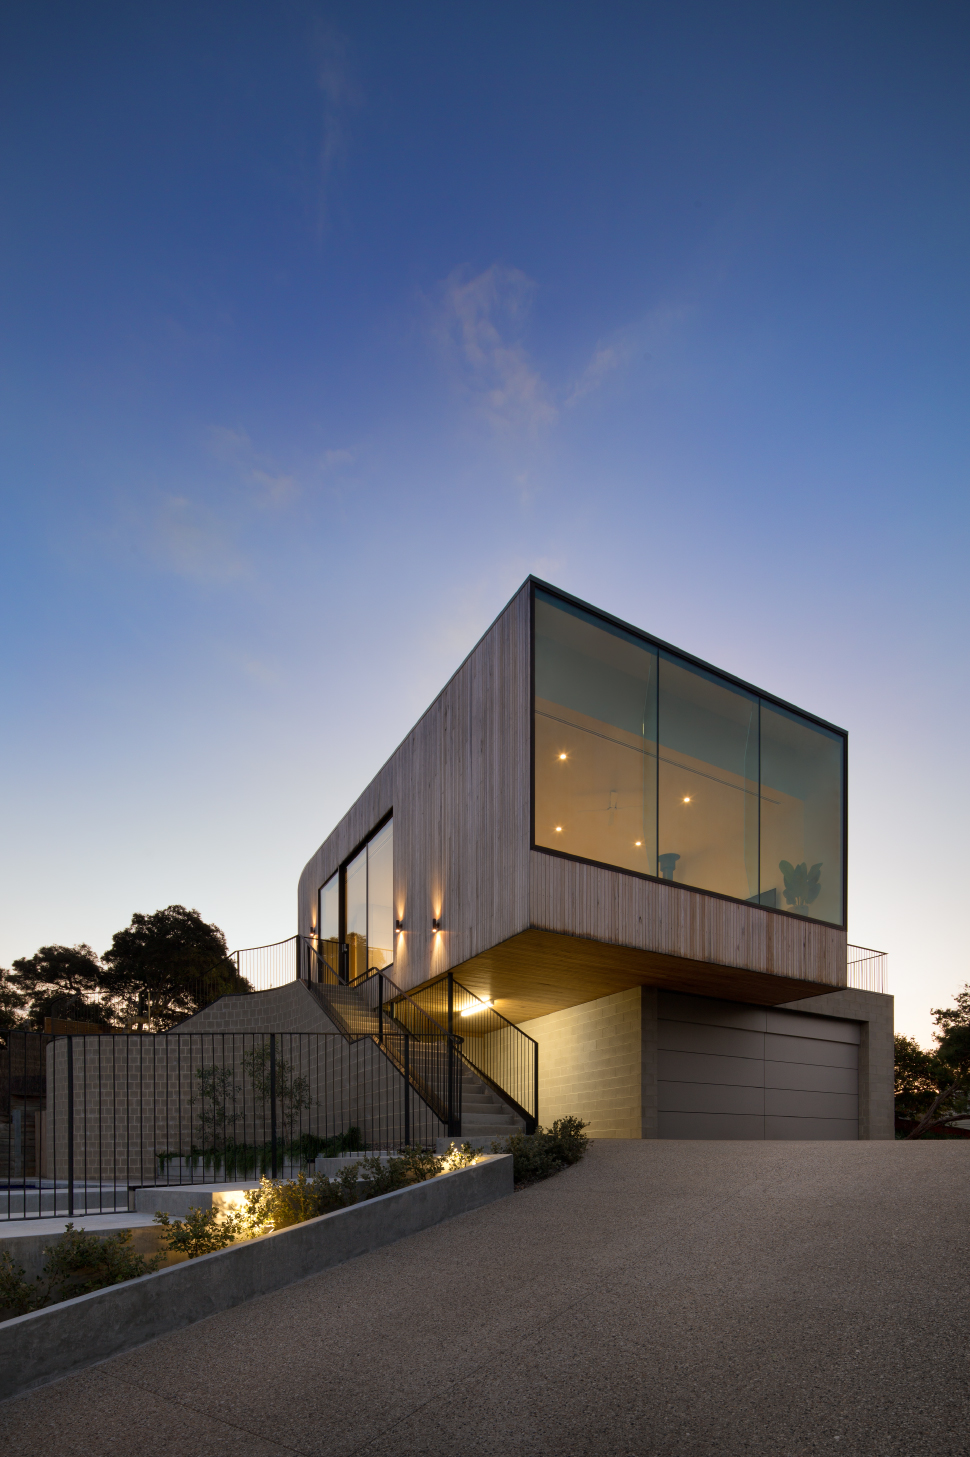 parkside beach house by cera stribley architects_22